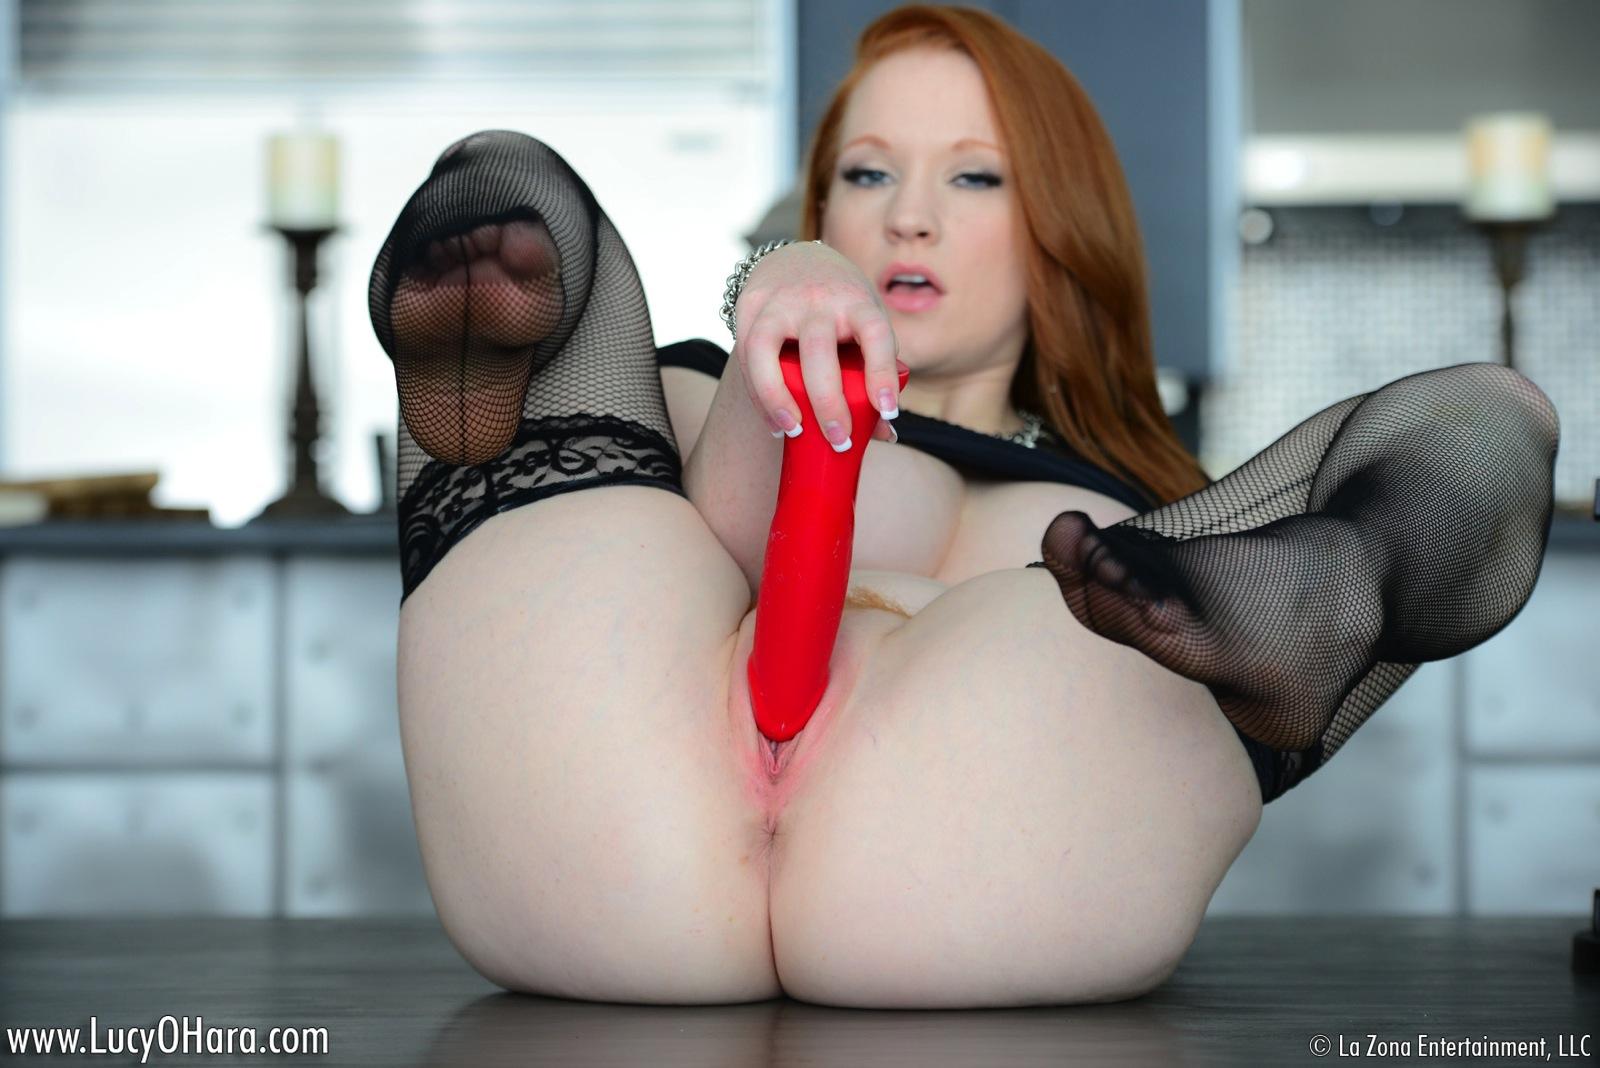 Sexy Redhead Lucy Ohara Upskirt - Youporn lucy - MegaPornX.com